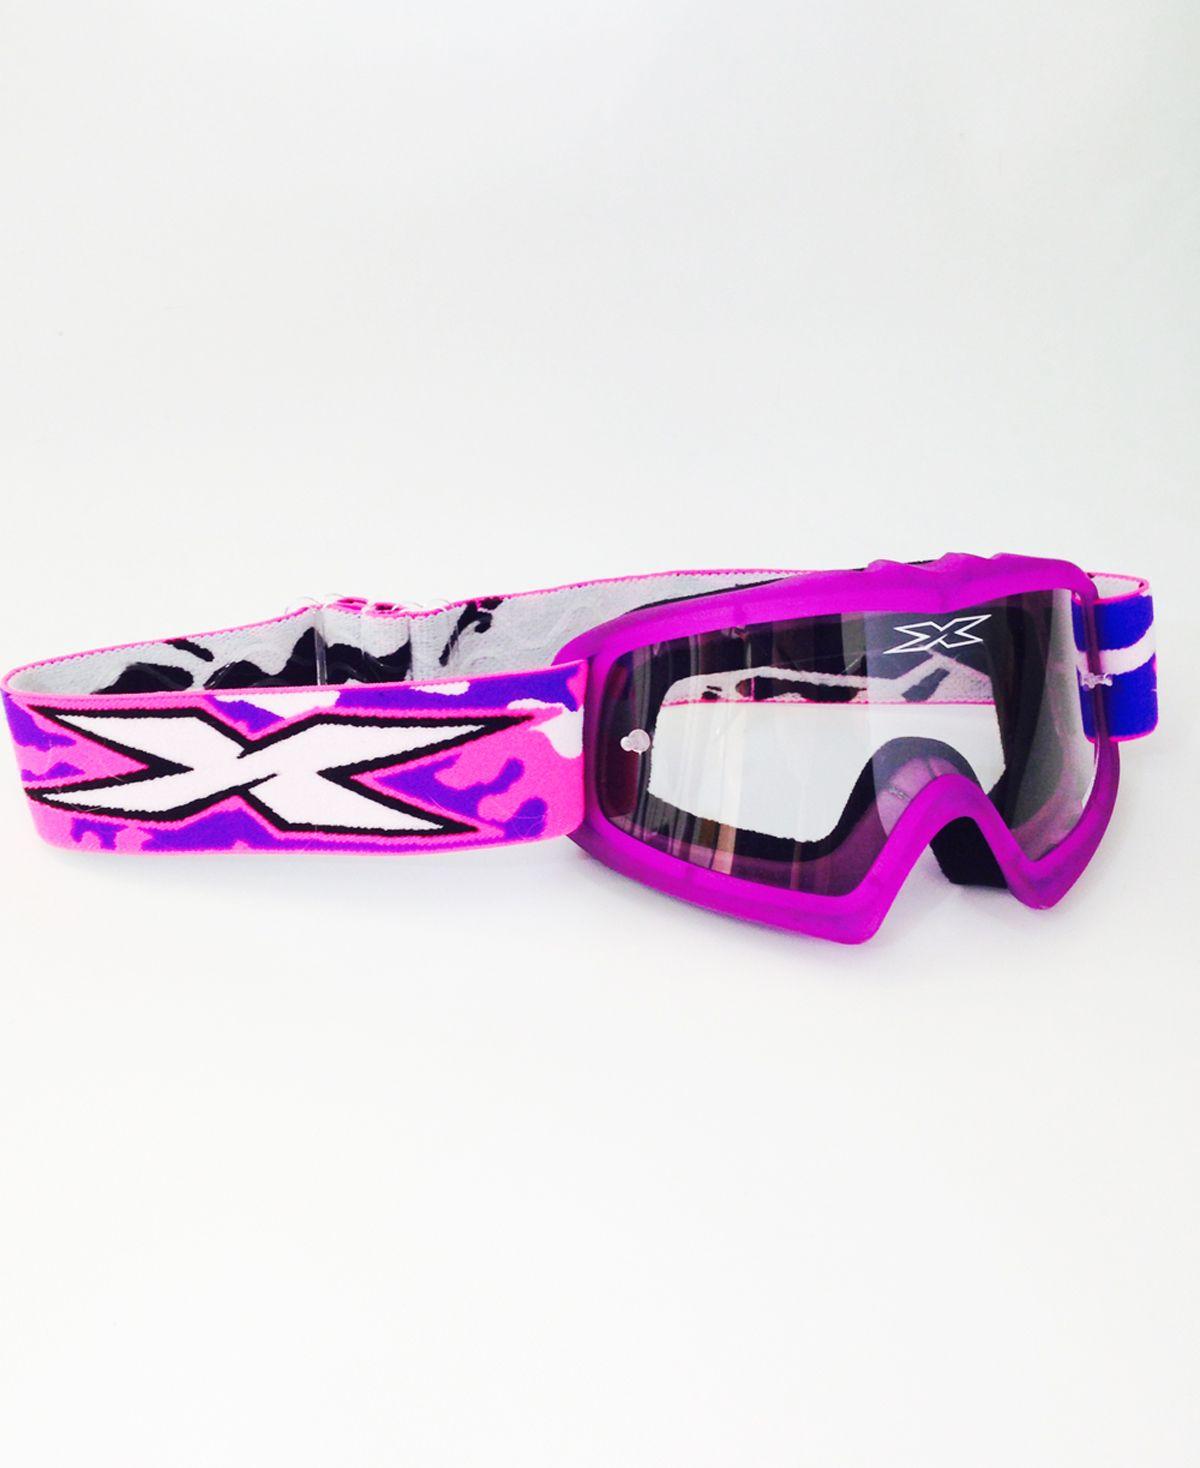 【EKS (X) Brand】兒童用越野風鏡 『X-GROM』 - 「Webike-摩托百貨」